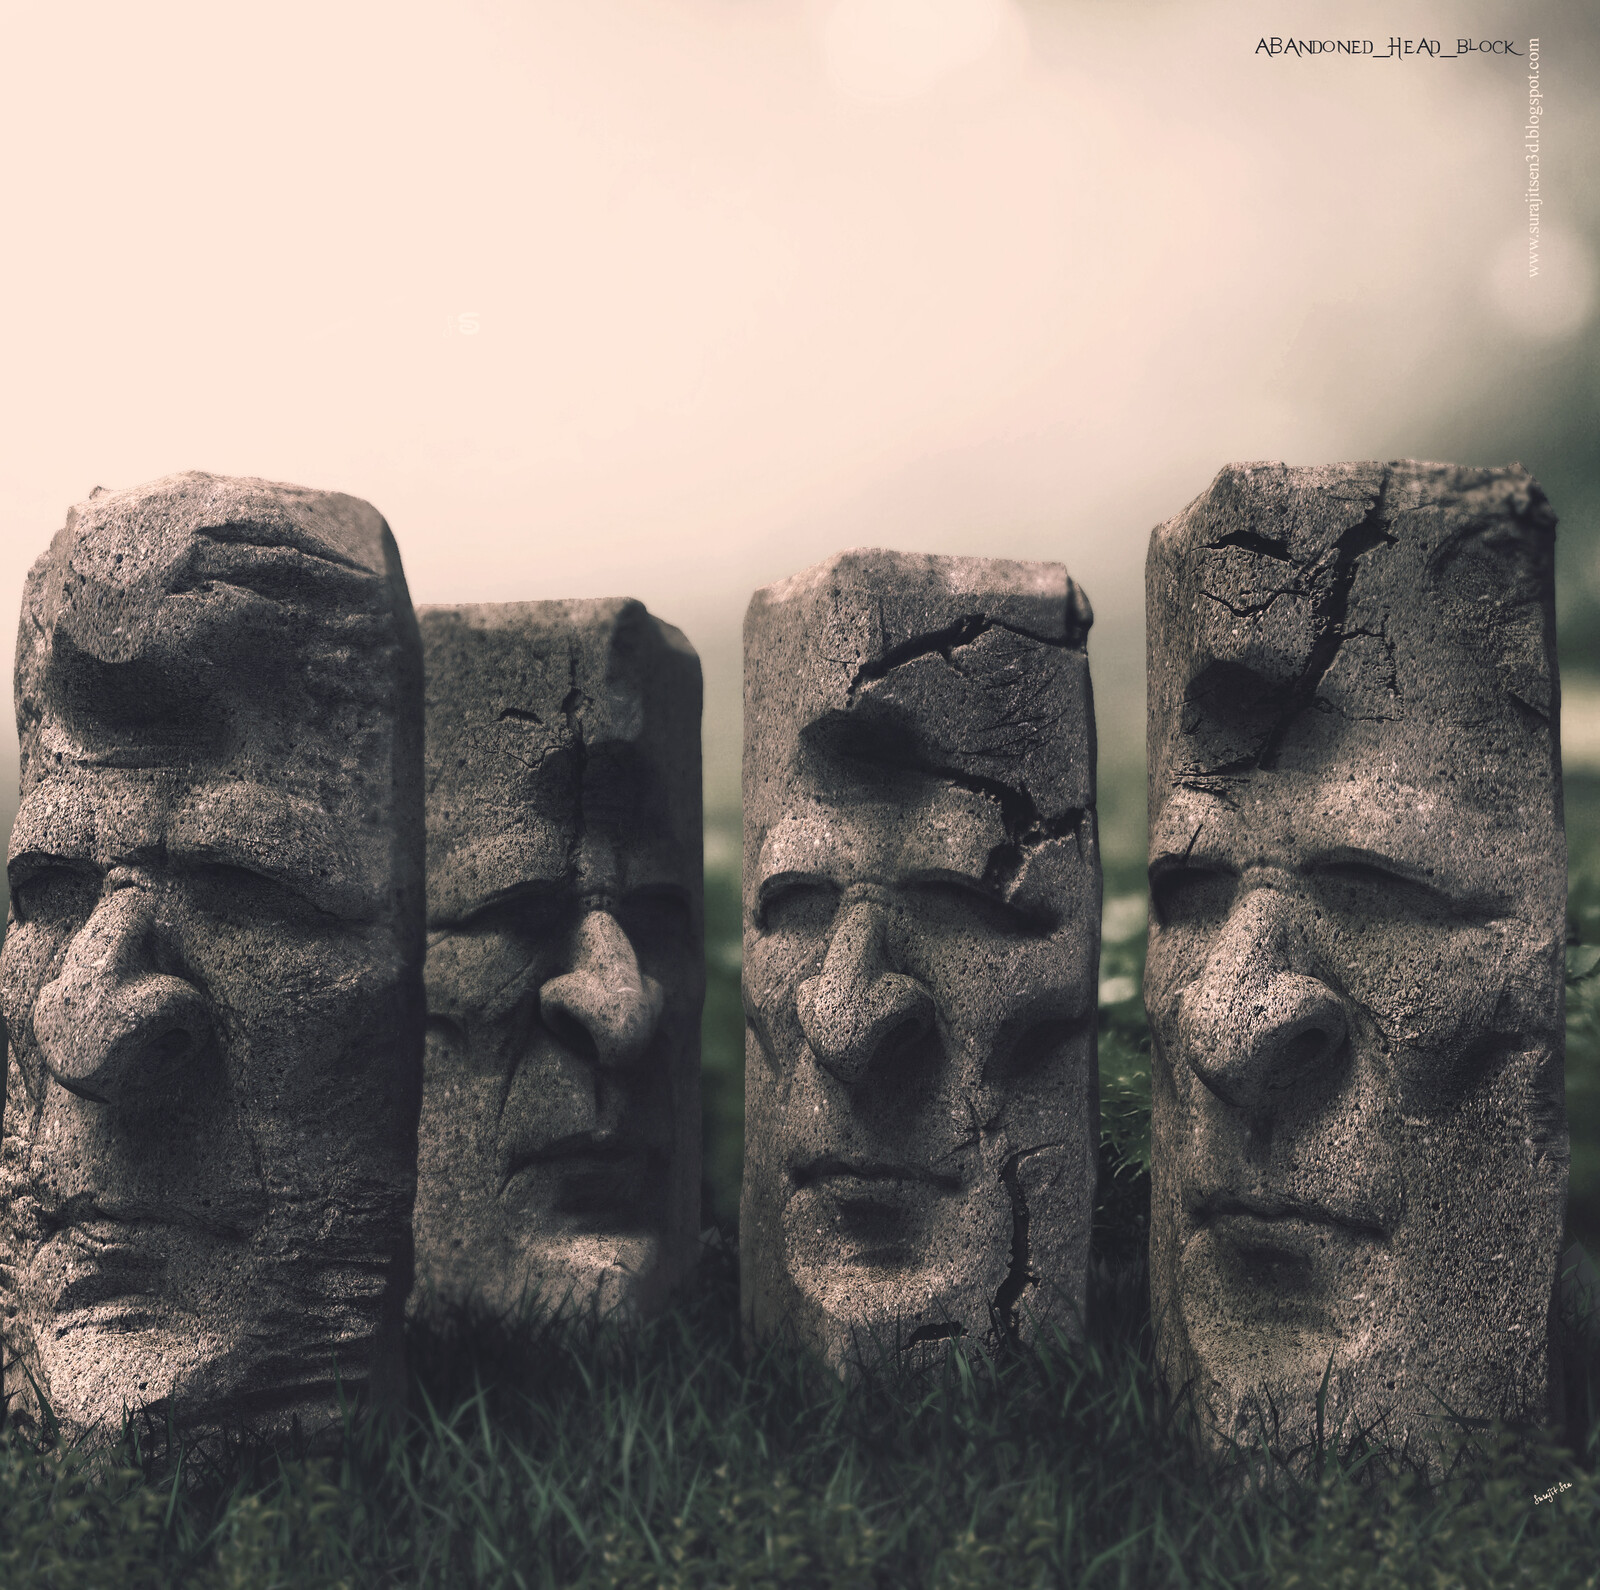 Abandoned_Head_Blocks Digital Sculpture Quick Sculpting Background music- #hanszimmermusic